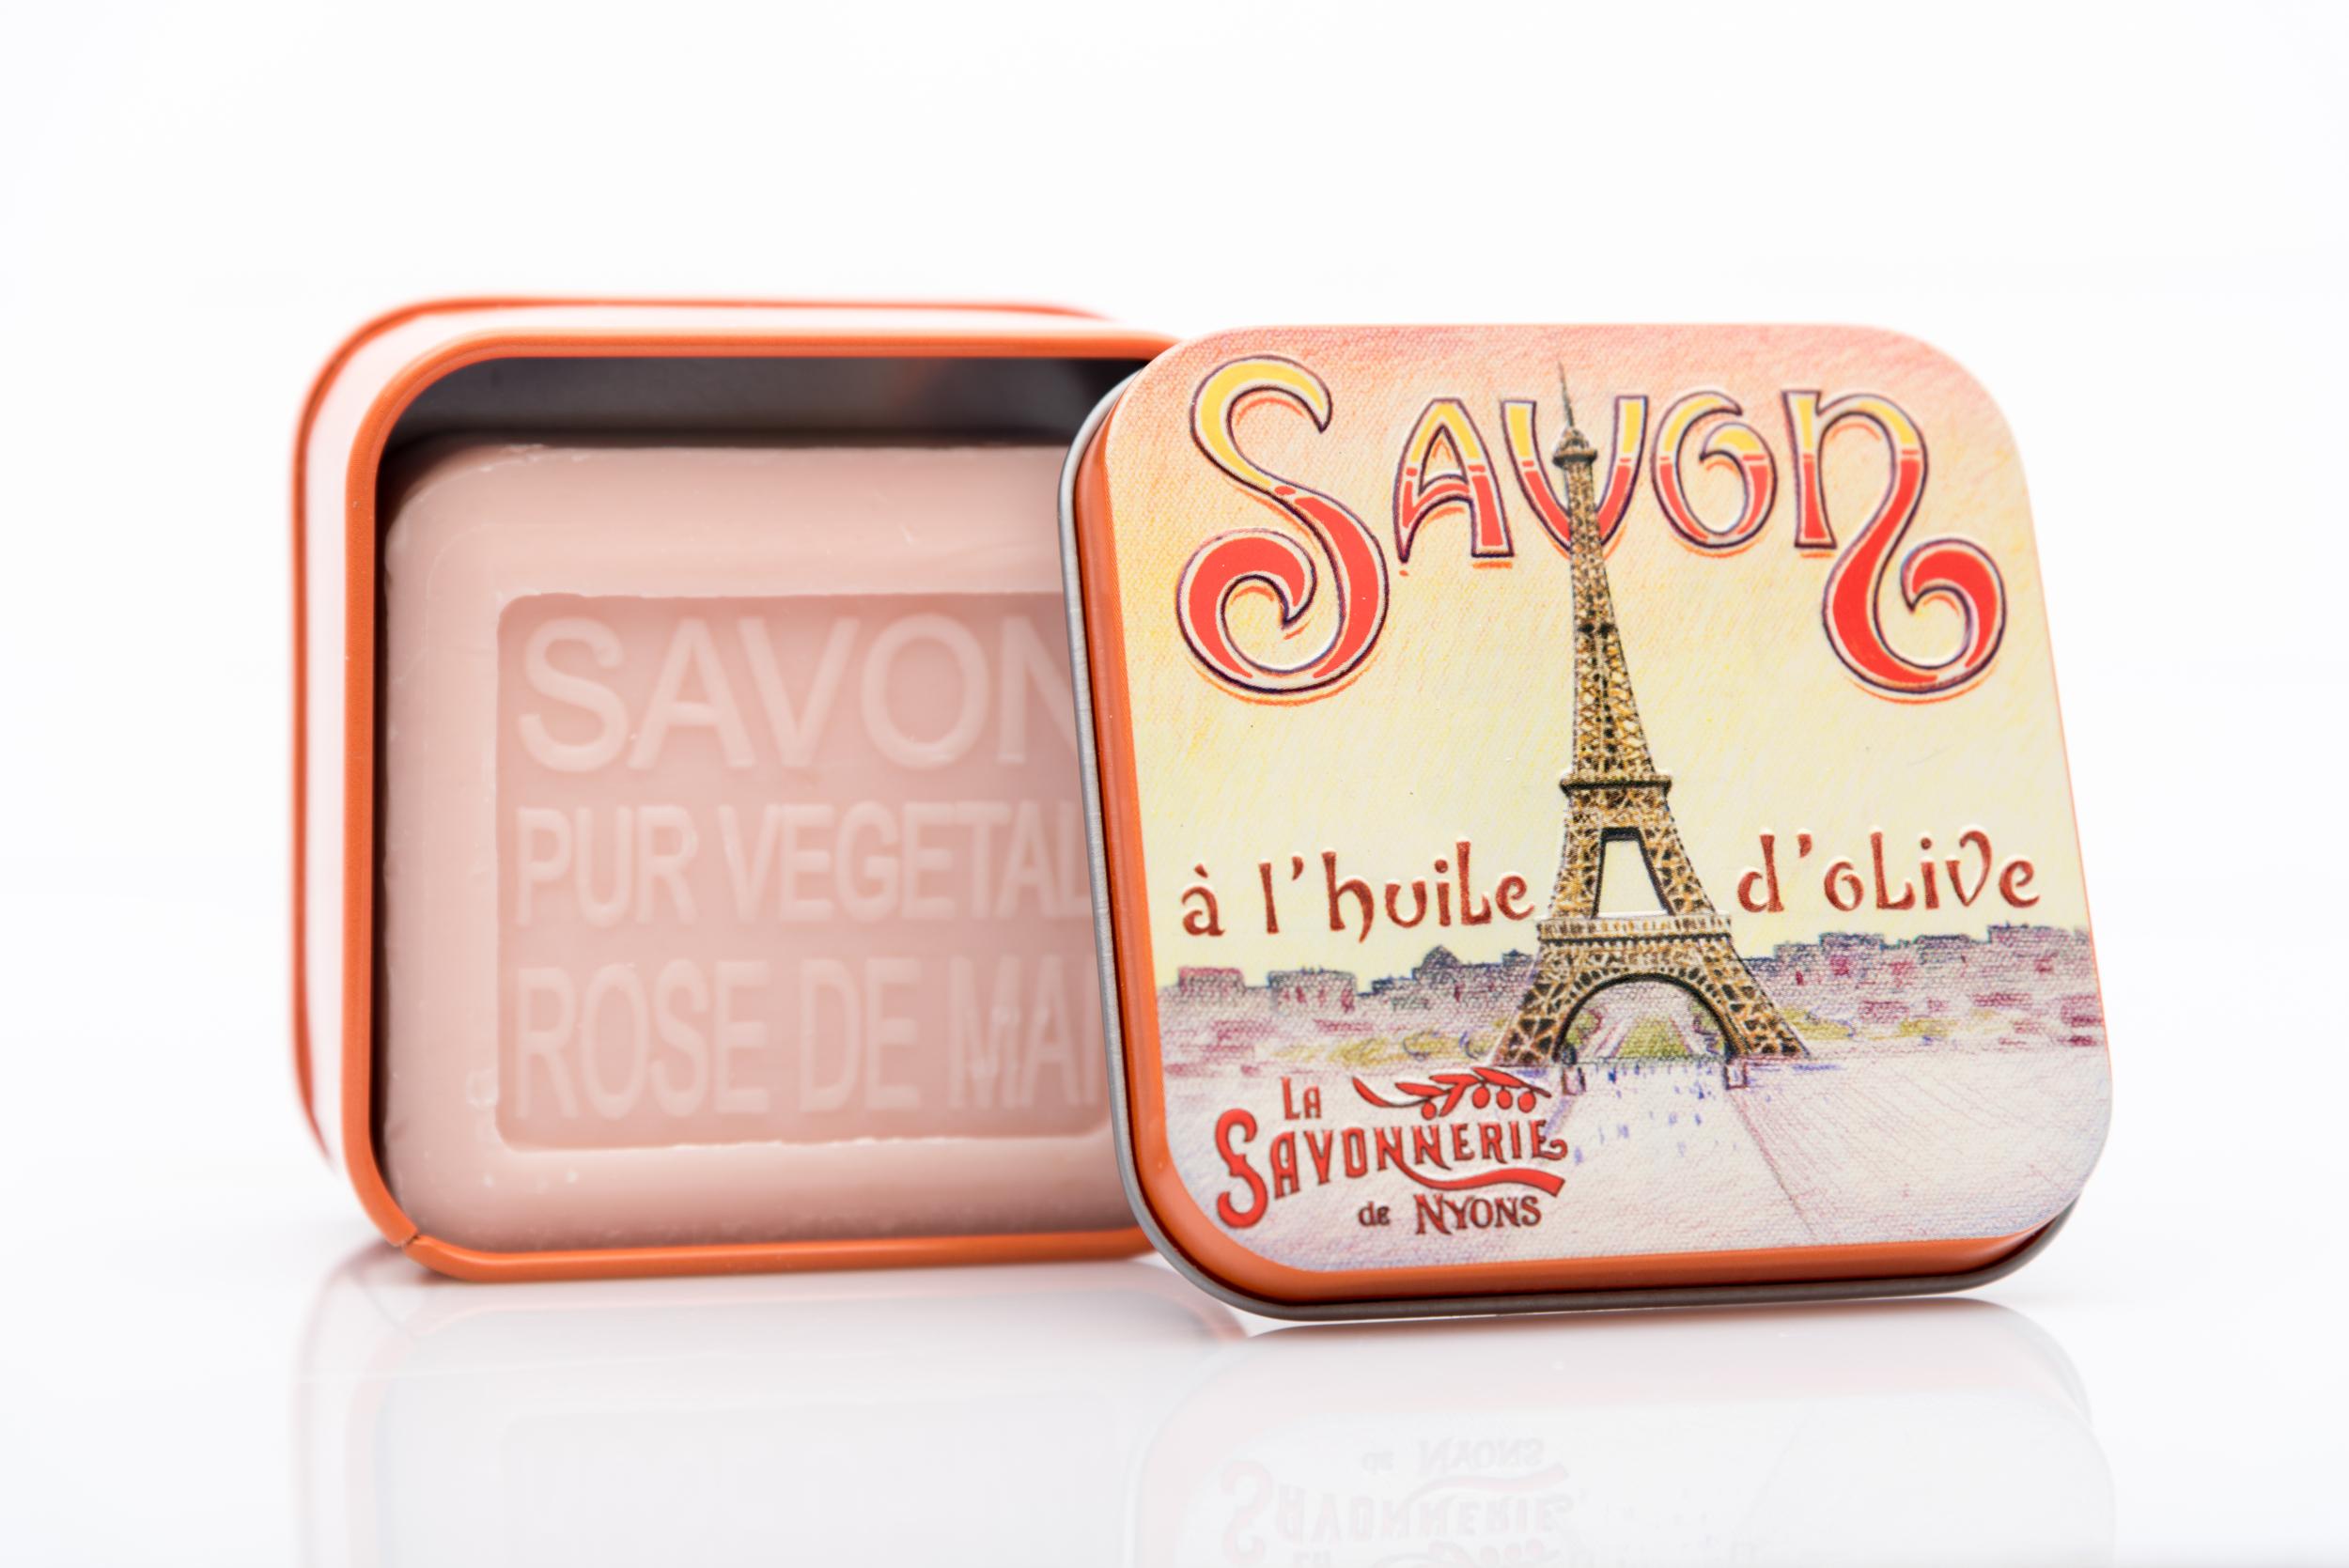 SAVON DE NYONS VEGETAL MADE IN FRANCE AVEC BOITE METALIQUE MODELE 45 A LA ROSE DE MAI